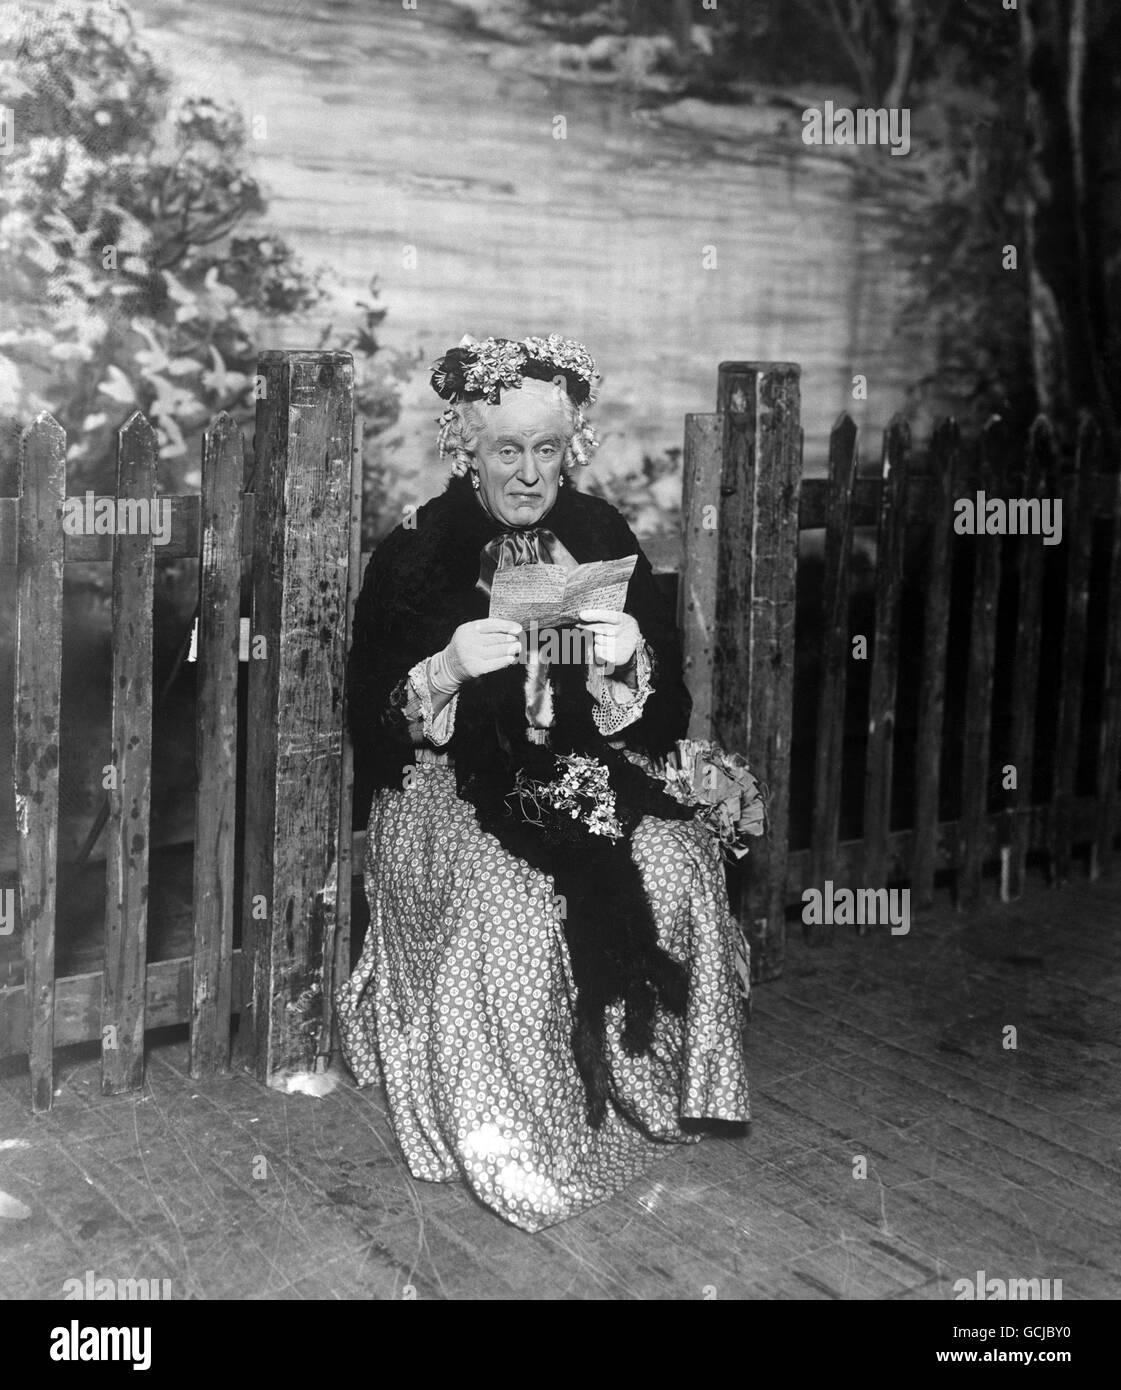 Entertainment - Pantomime - London - Stock Image